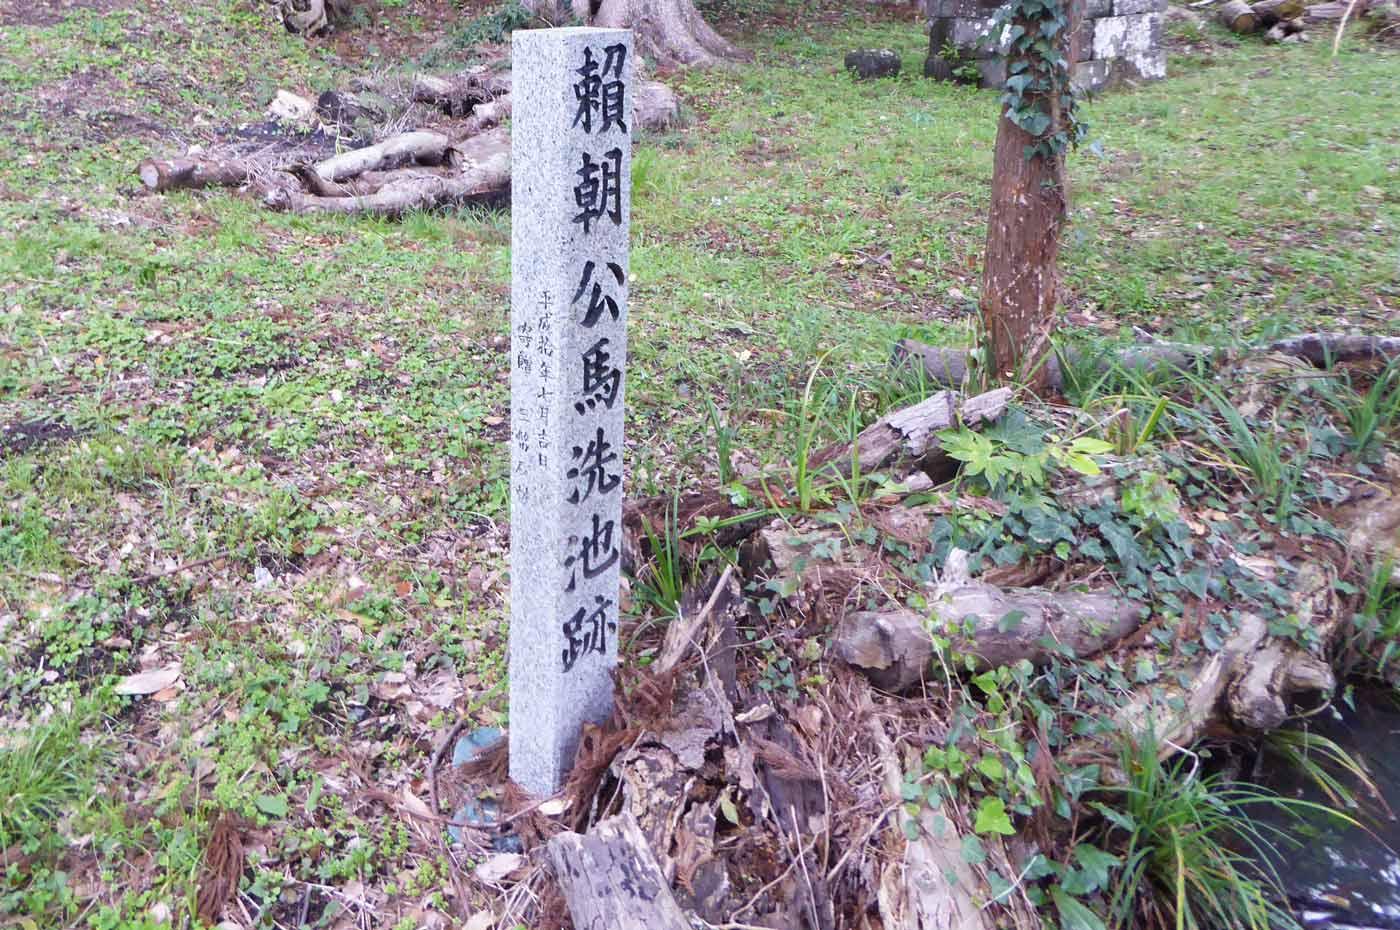 下立松原神境内の頼朝公馬洗池跡の画像